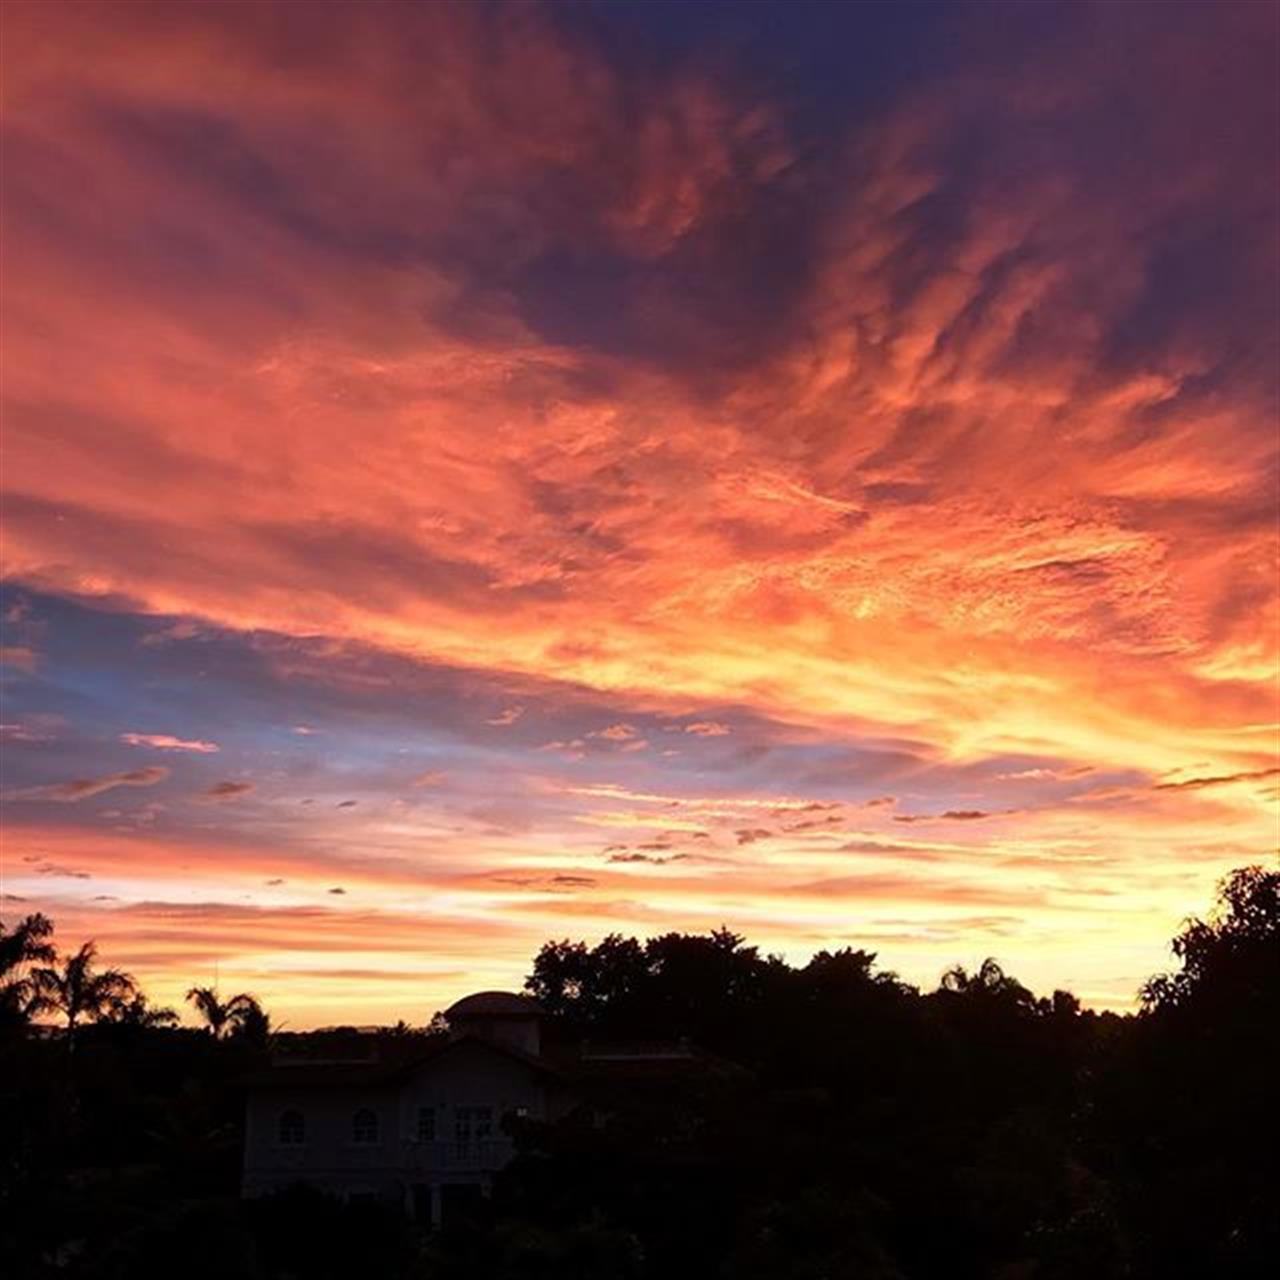 Caribbean Sunset! #caribbean #DR #leadingrelocal #sunset